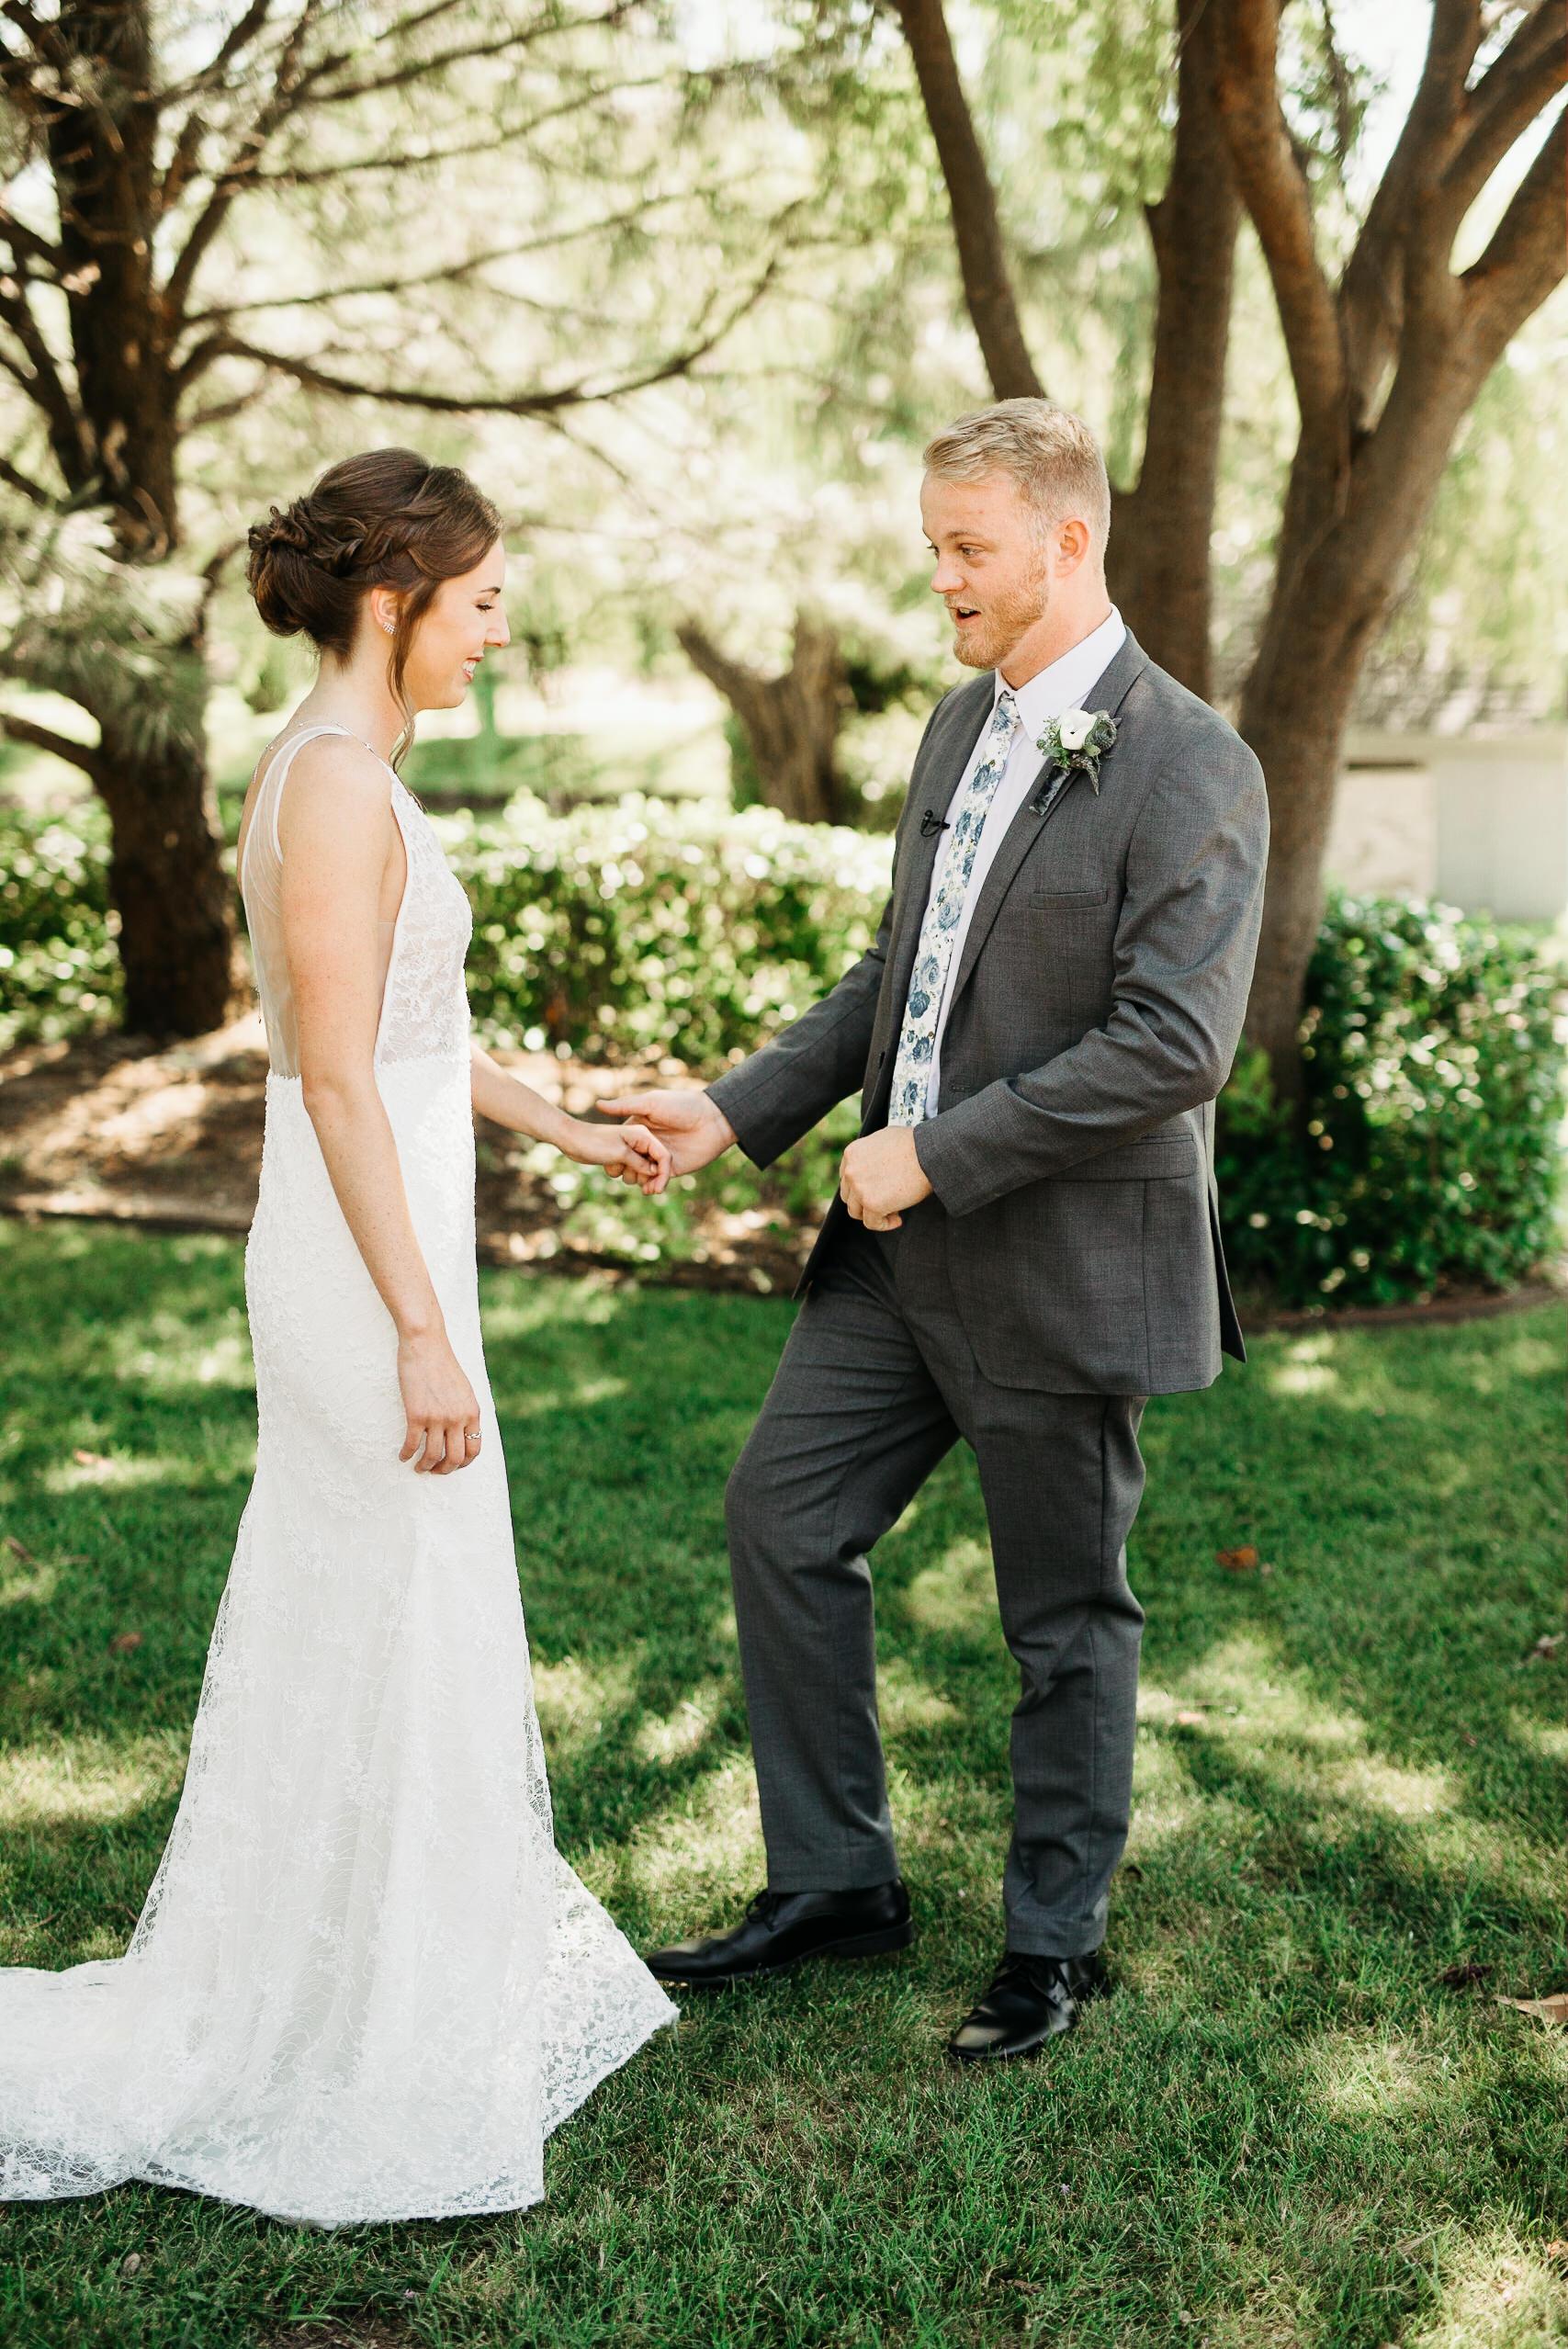 okc-wedding-photographer-coles-garden-wedding-okc-best-wedding-photographers-43.jpg